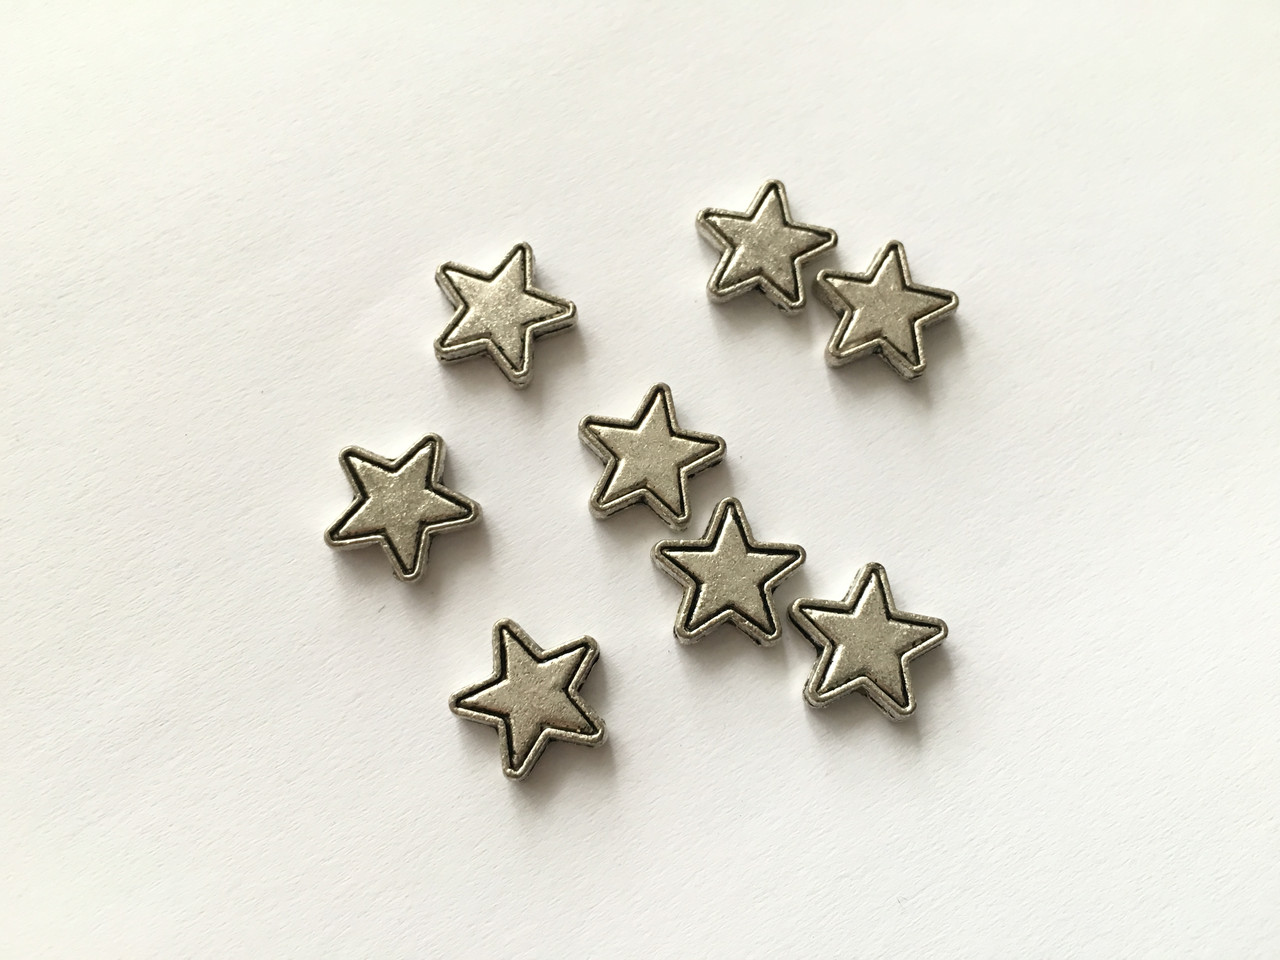 Звезда. Цвет античное серебро. 12мм